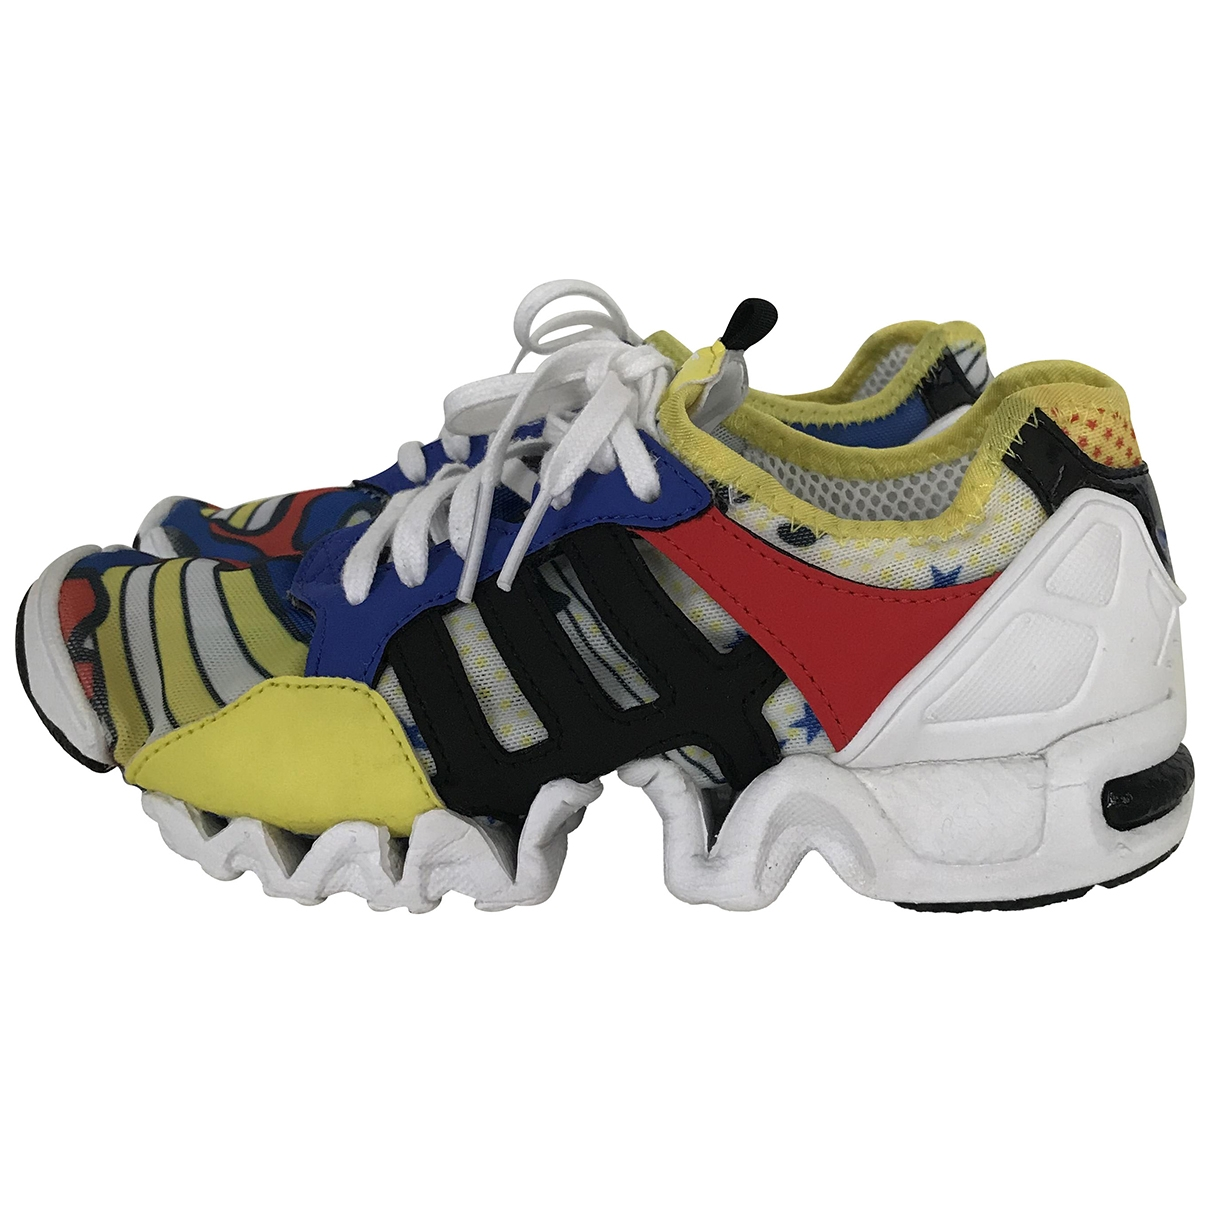 Adidas \N Multicolour Cloth Trainers for Women 37 EU